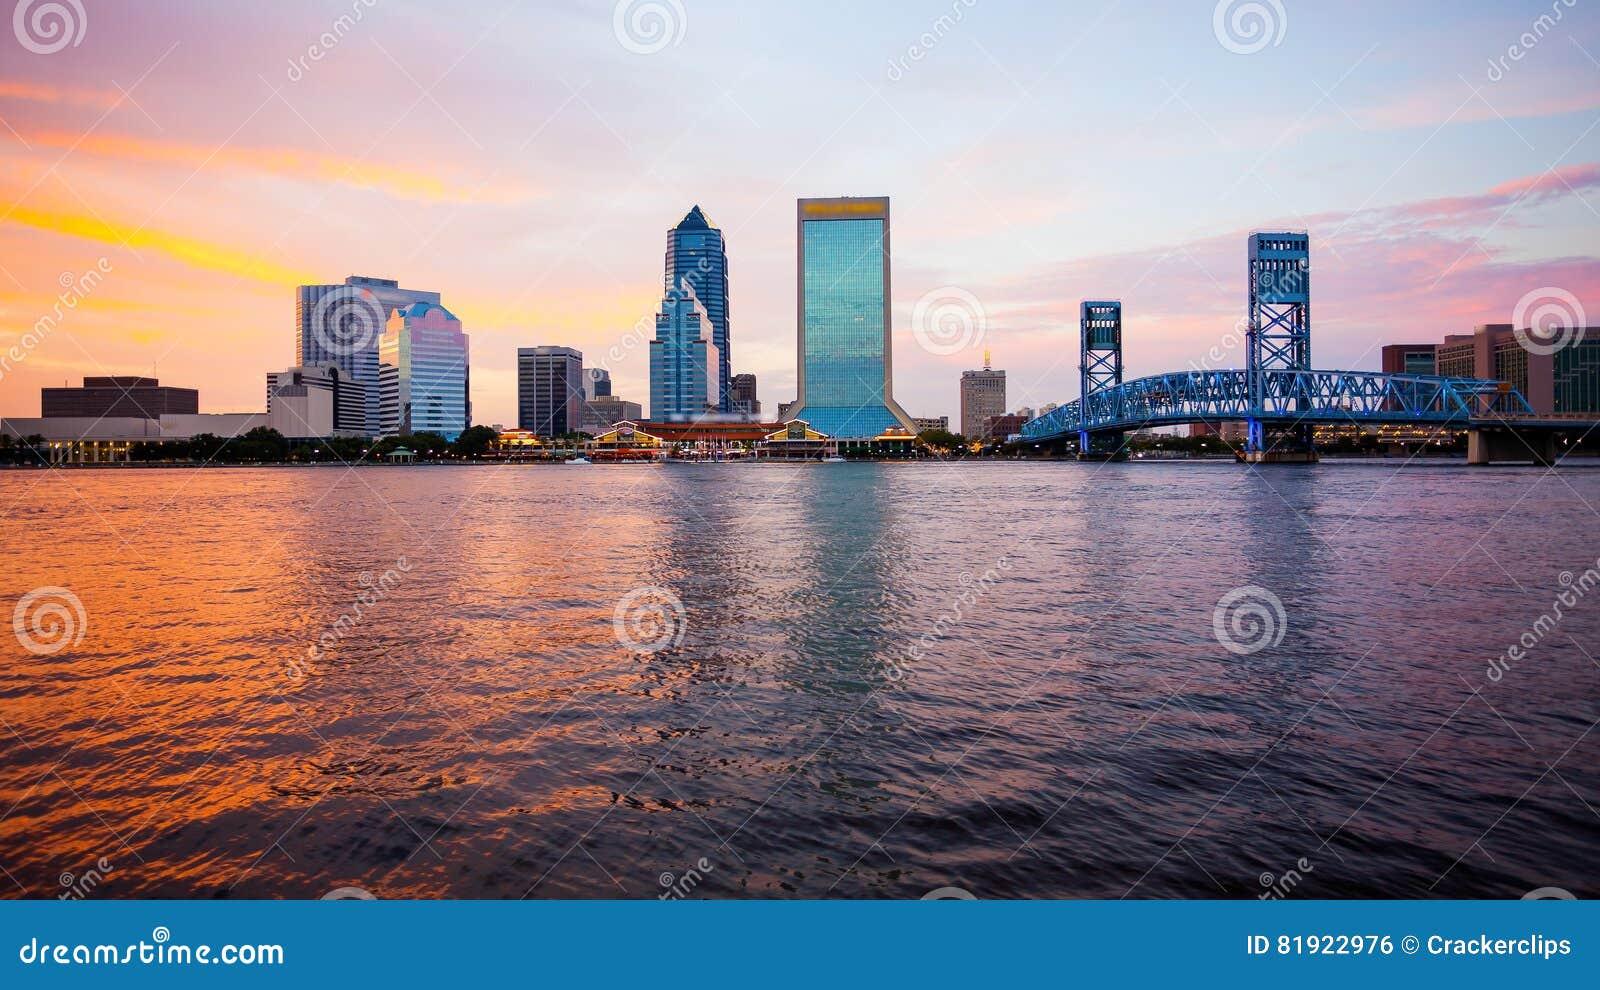 Jacksonville, Florida City Skyline at Sunset logos blurred